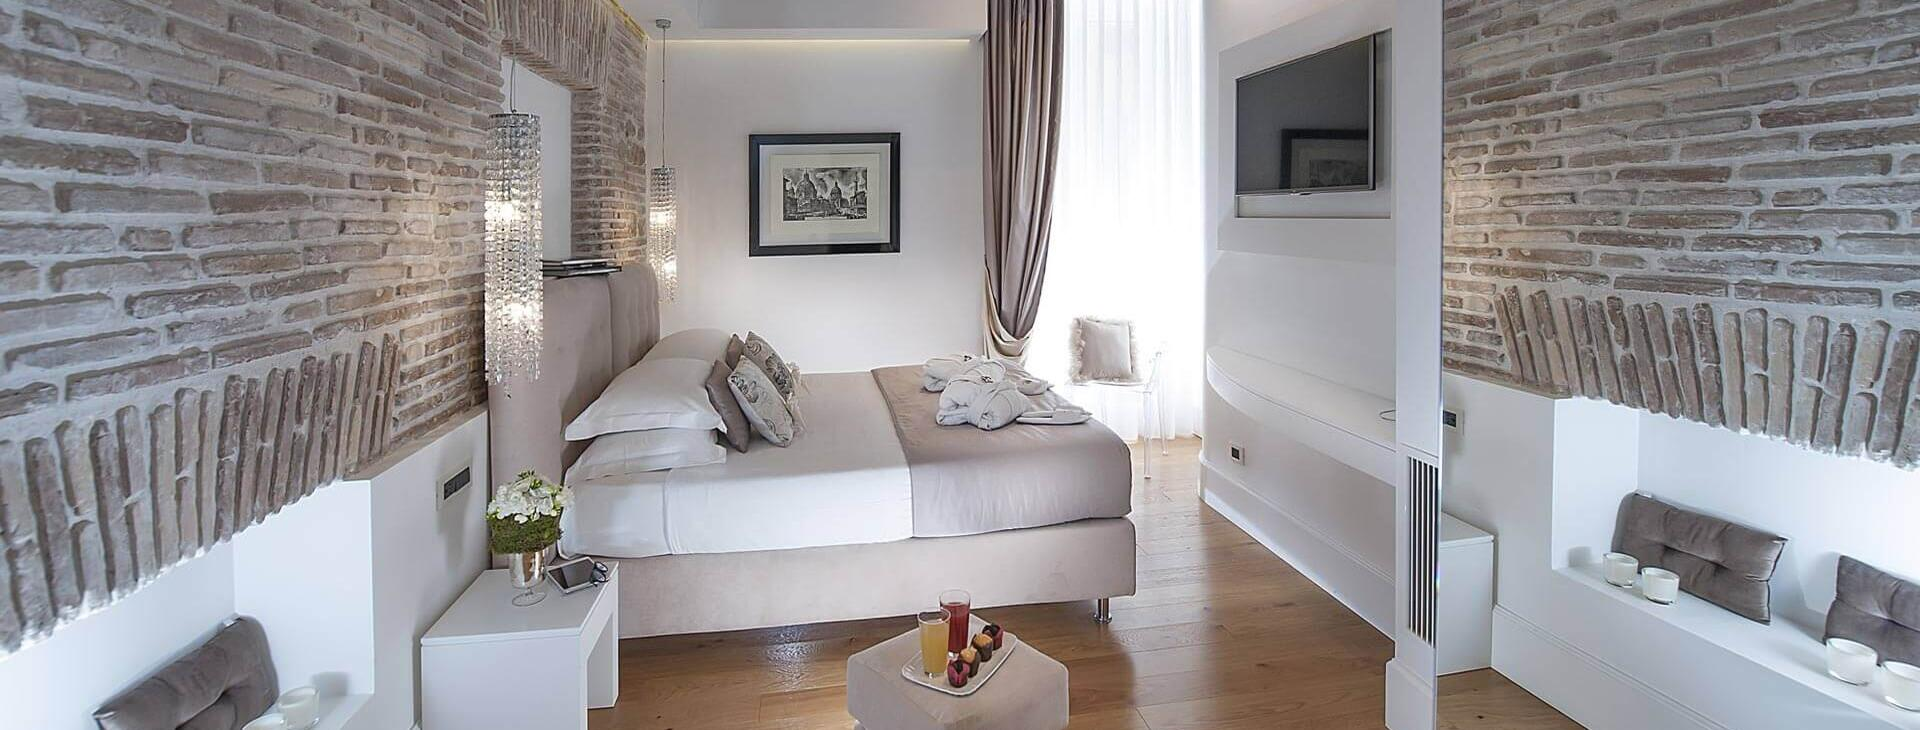 argentinastylehotel it camera-superior 001